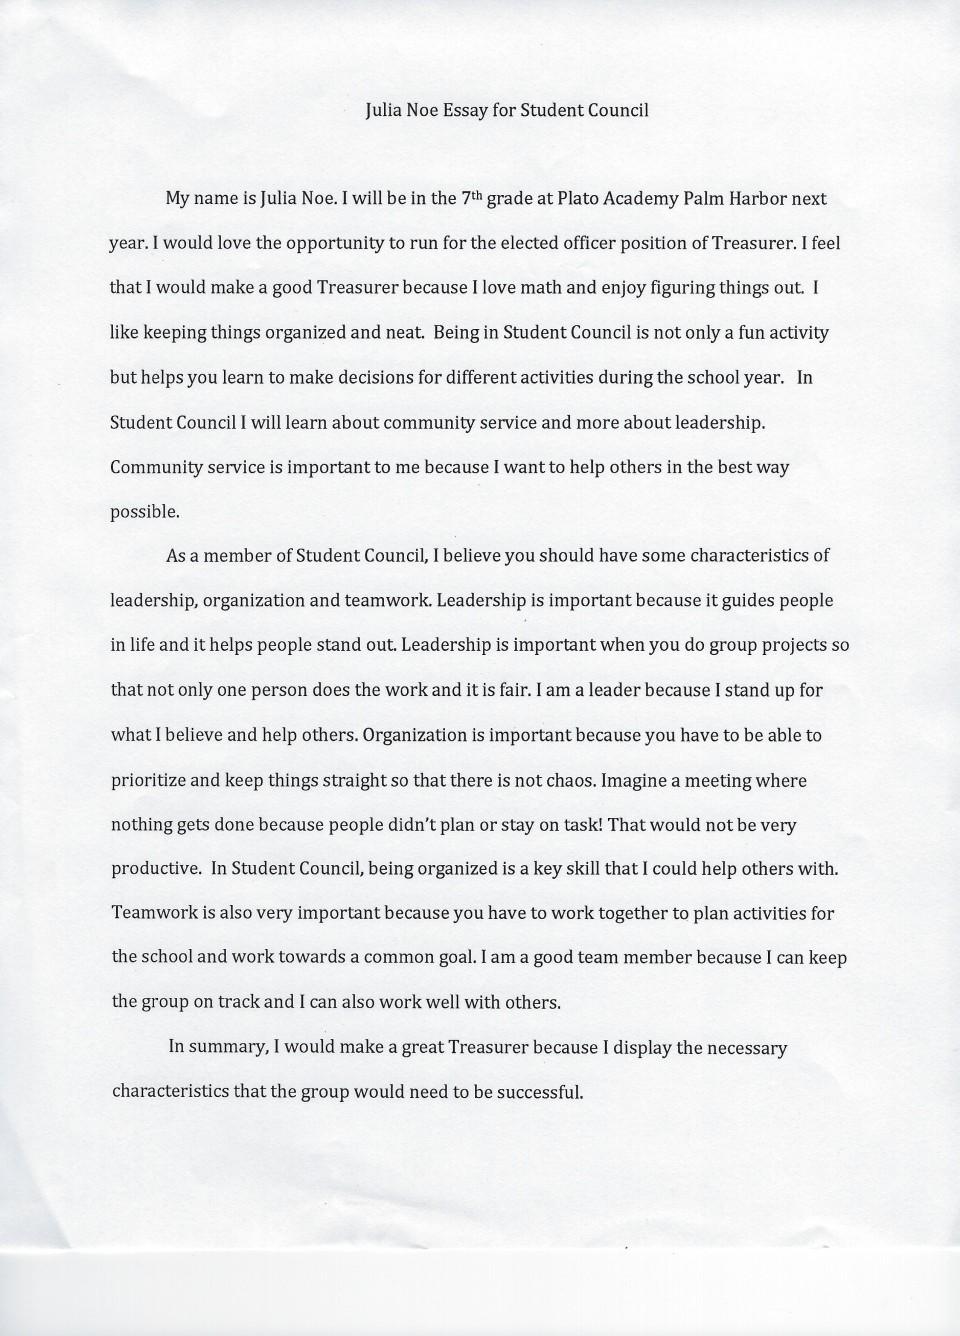 009 Student Council Essay Example Treasurer Noe Phenomenal Rubric President Conclusion 960